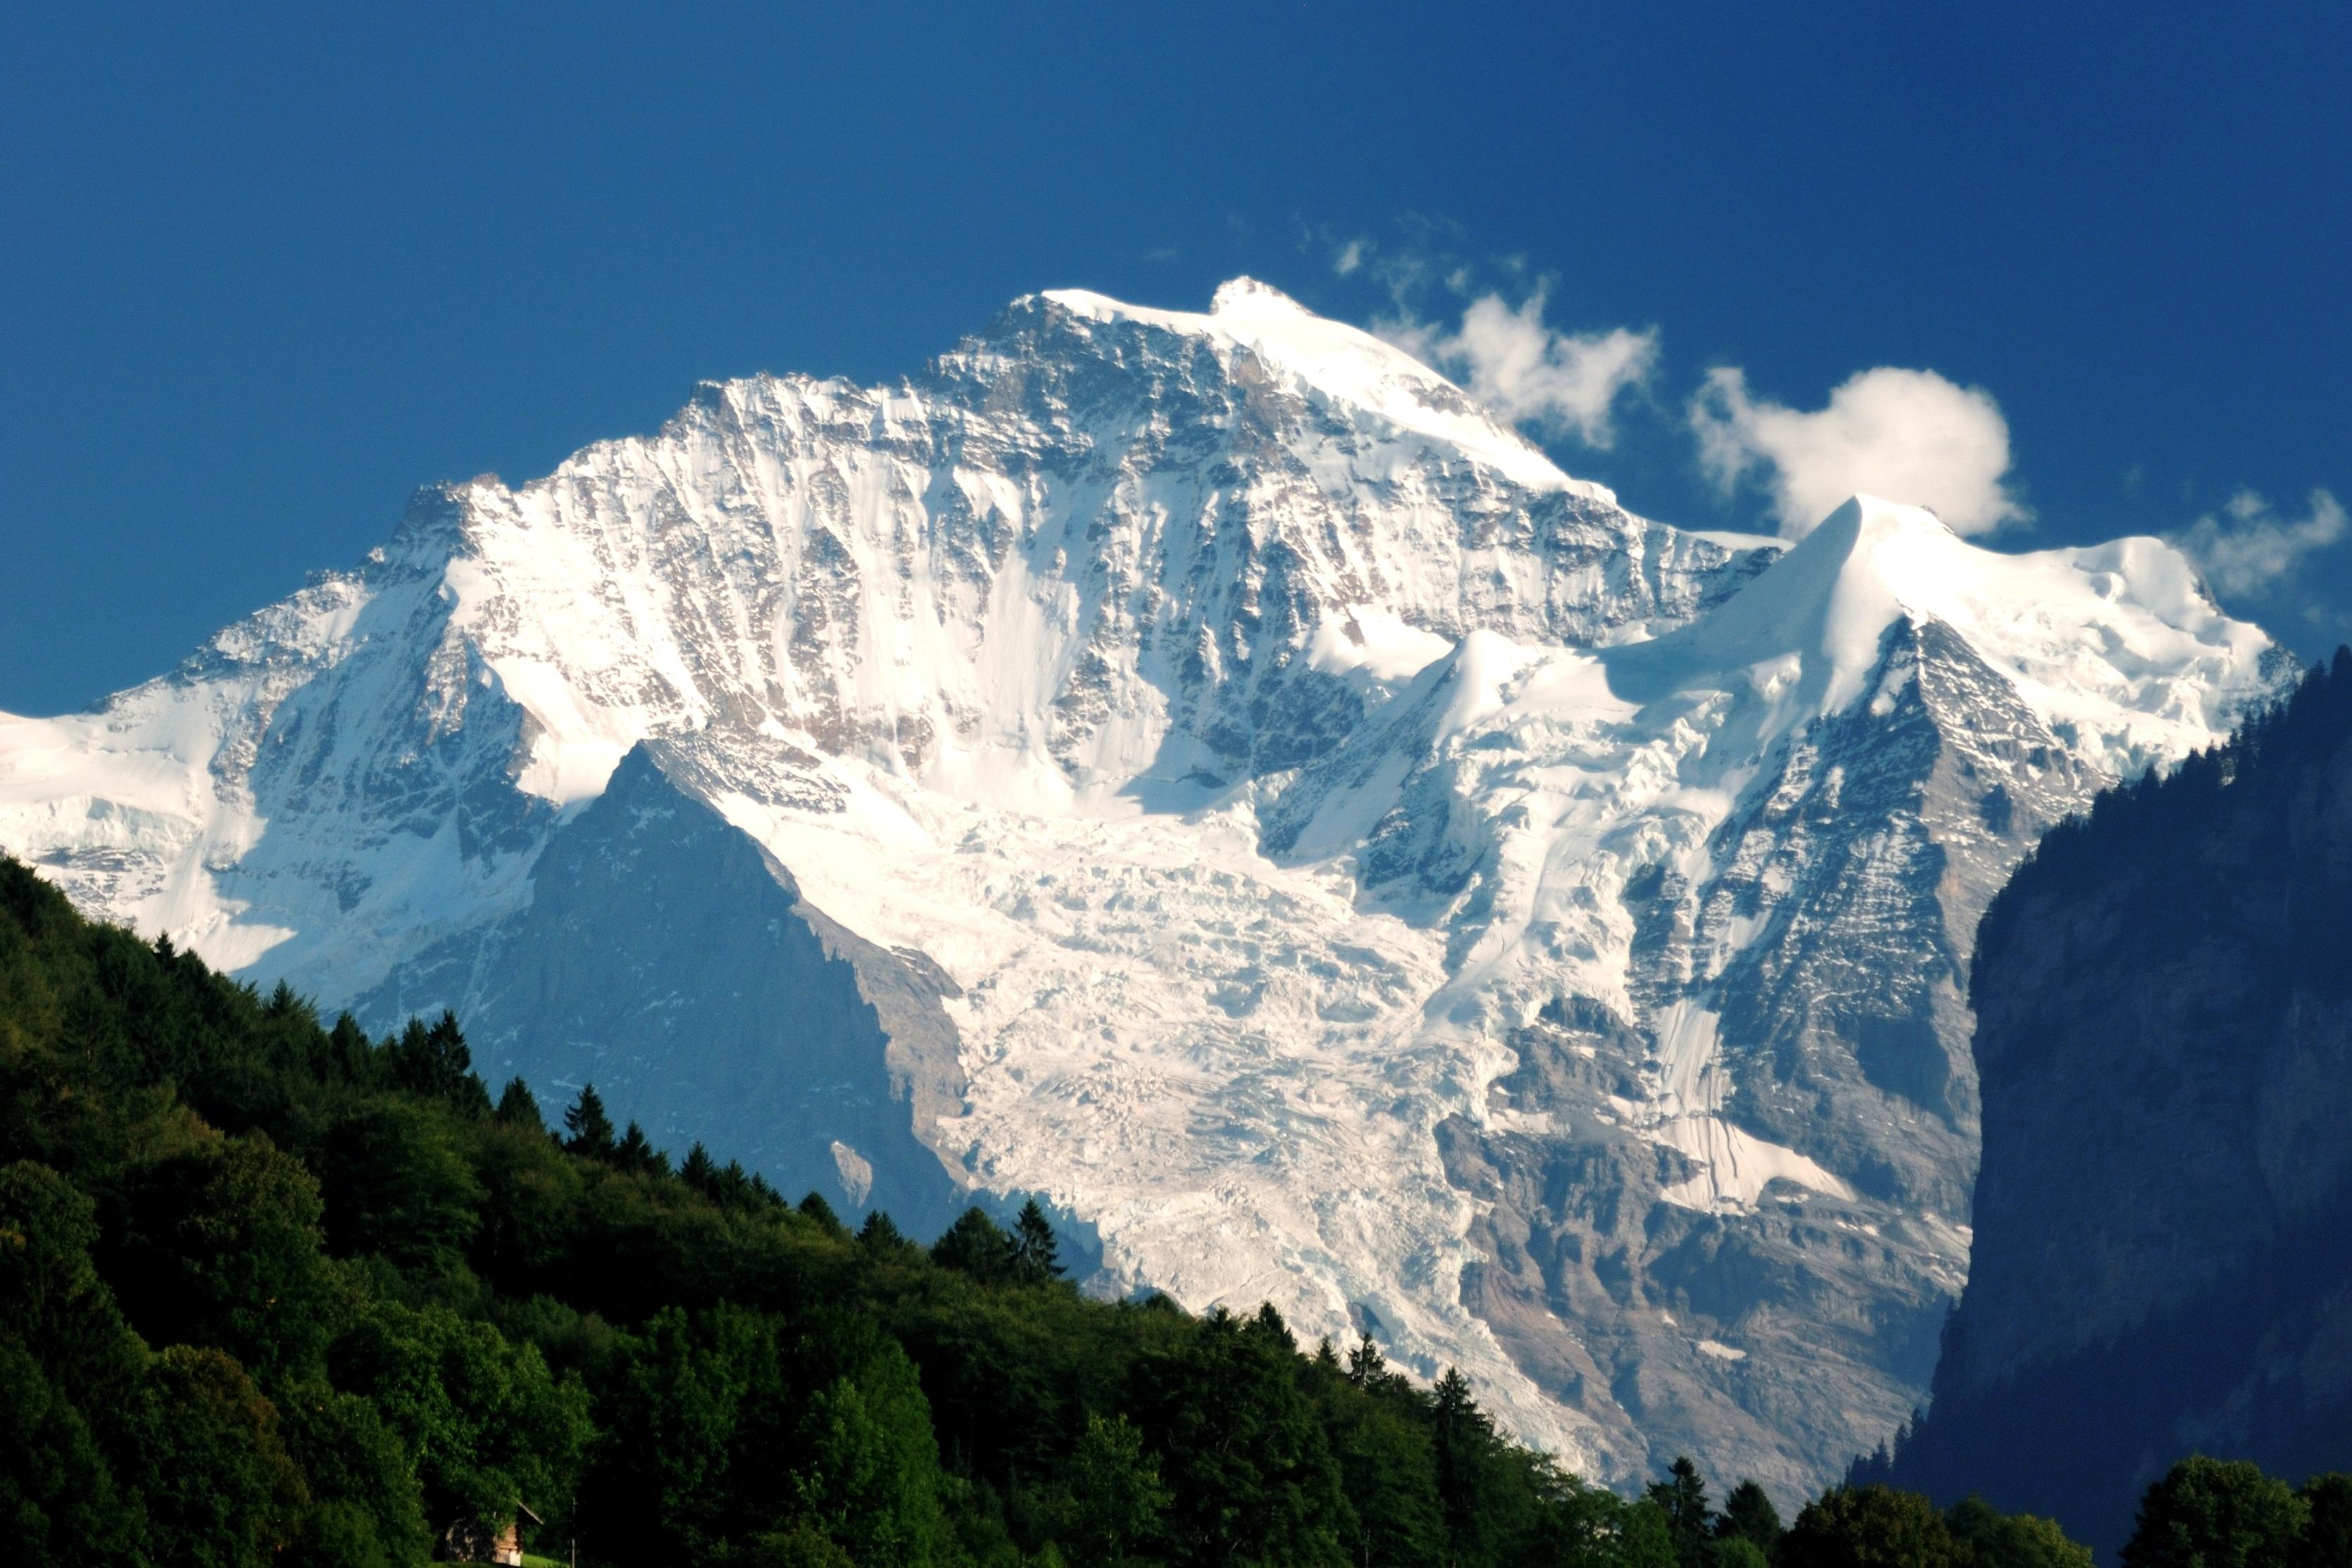 Jungfrau - definition - What is